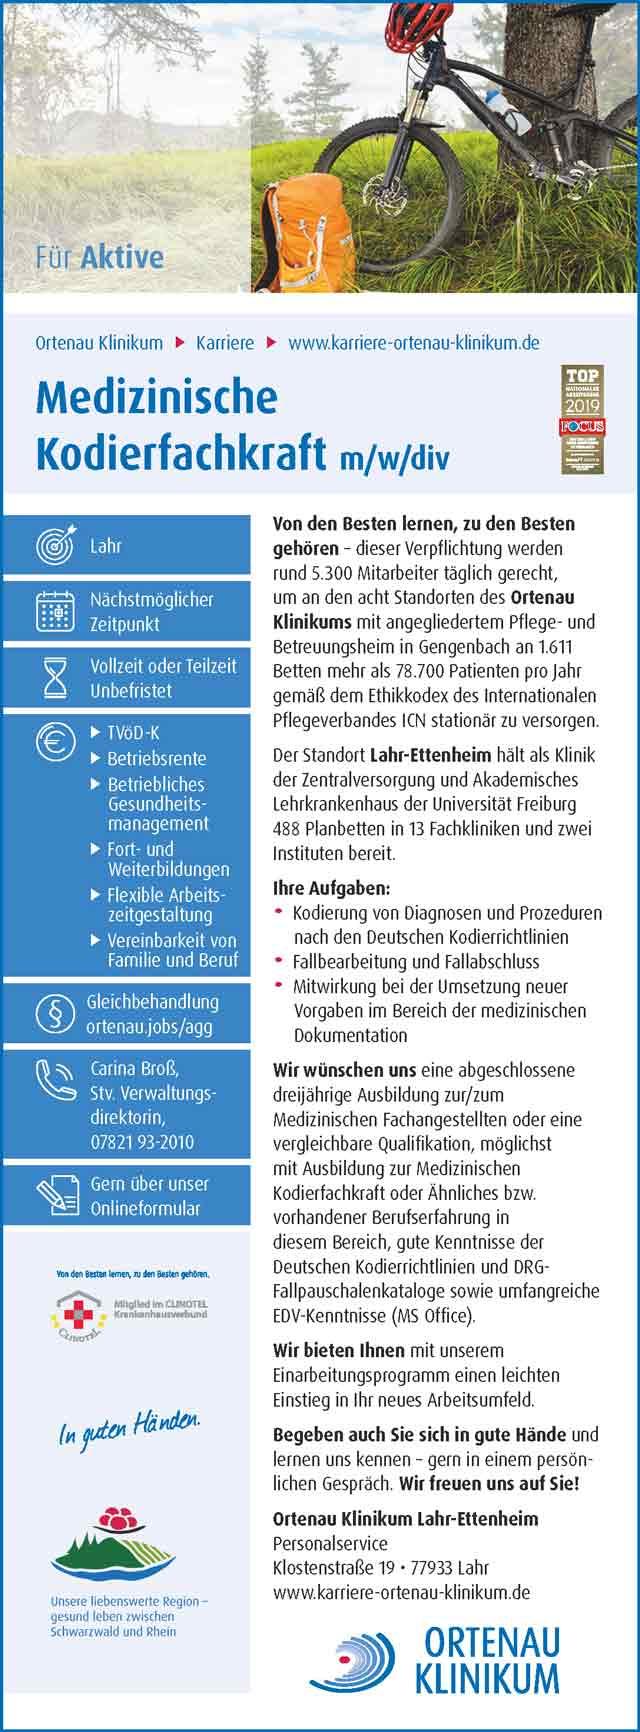 Ortenau Klinikum Lahr-Ettenheim: Medizinische Kodierfachkraft (m/w/d)